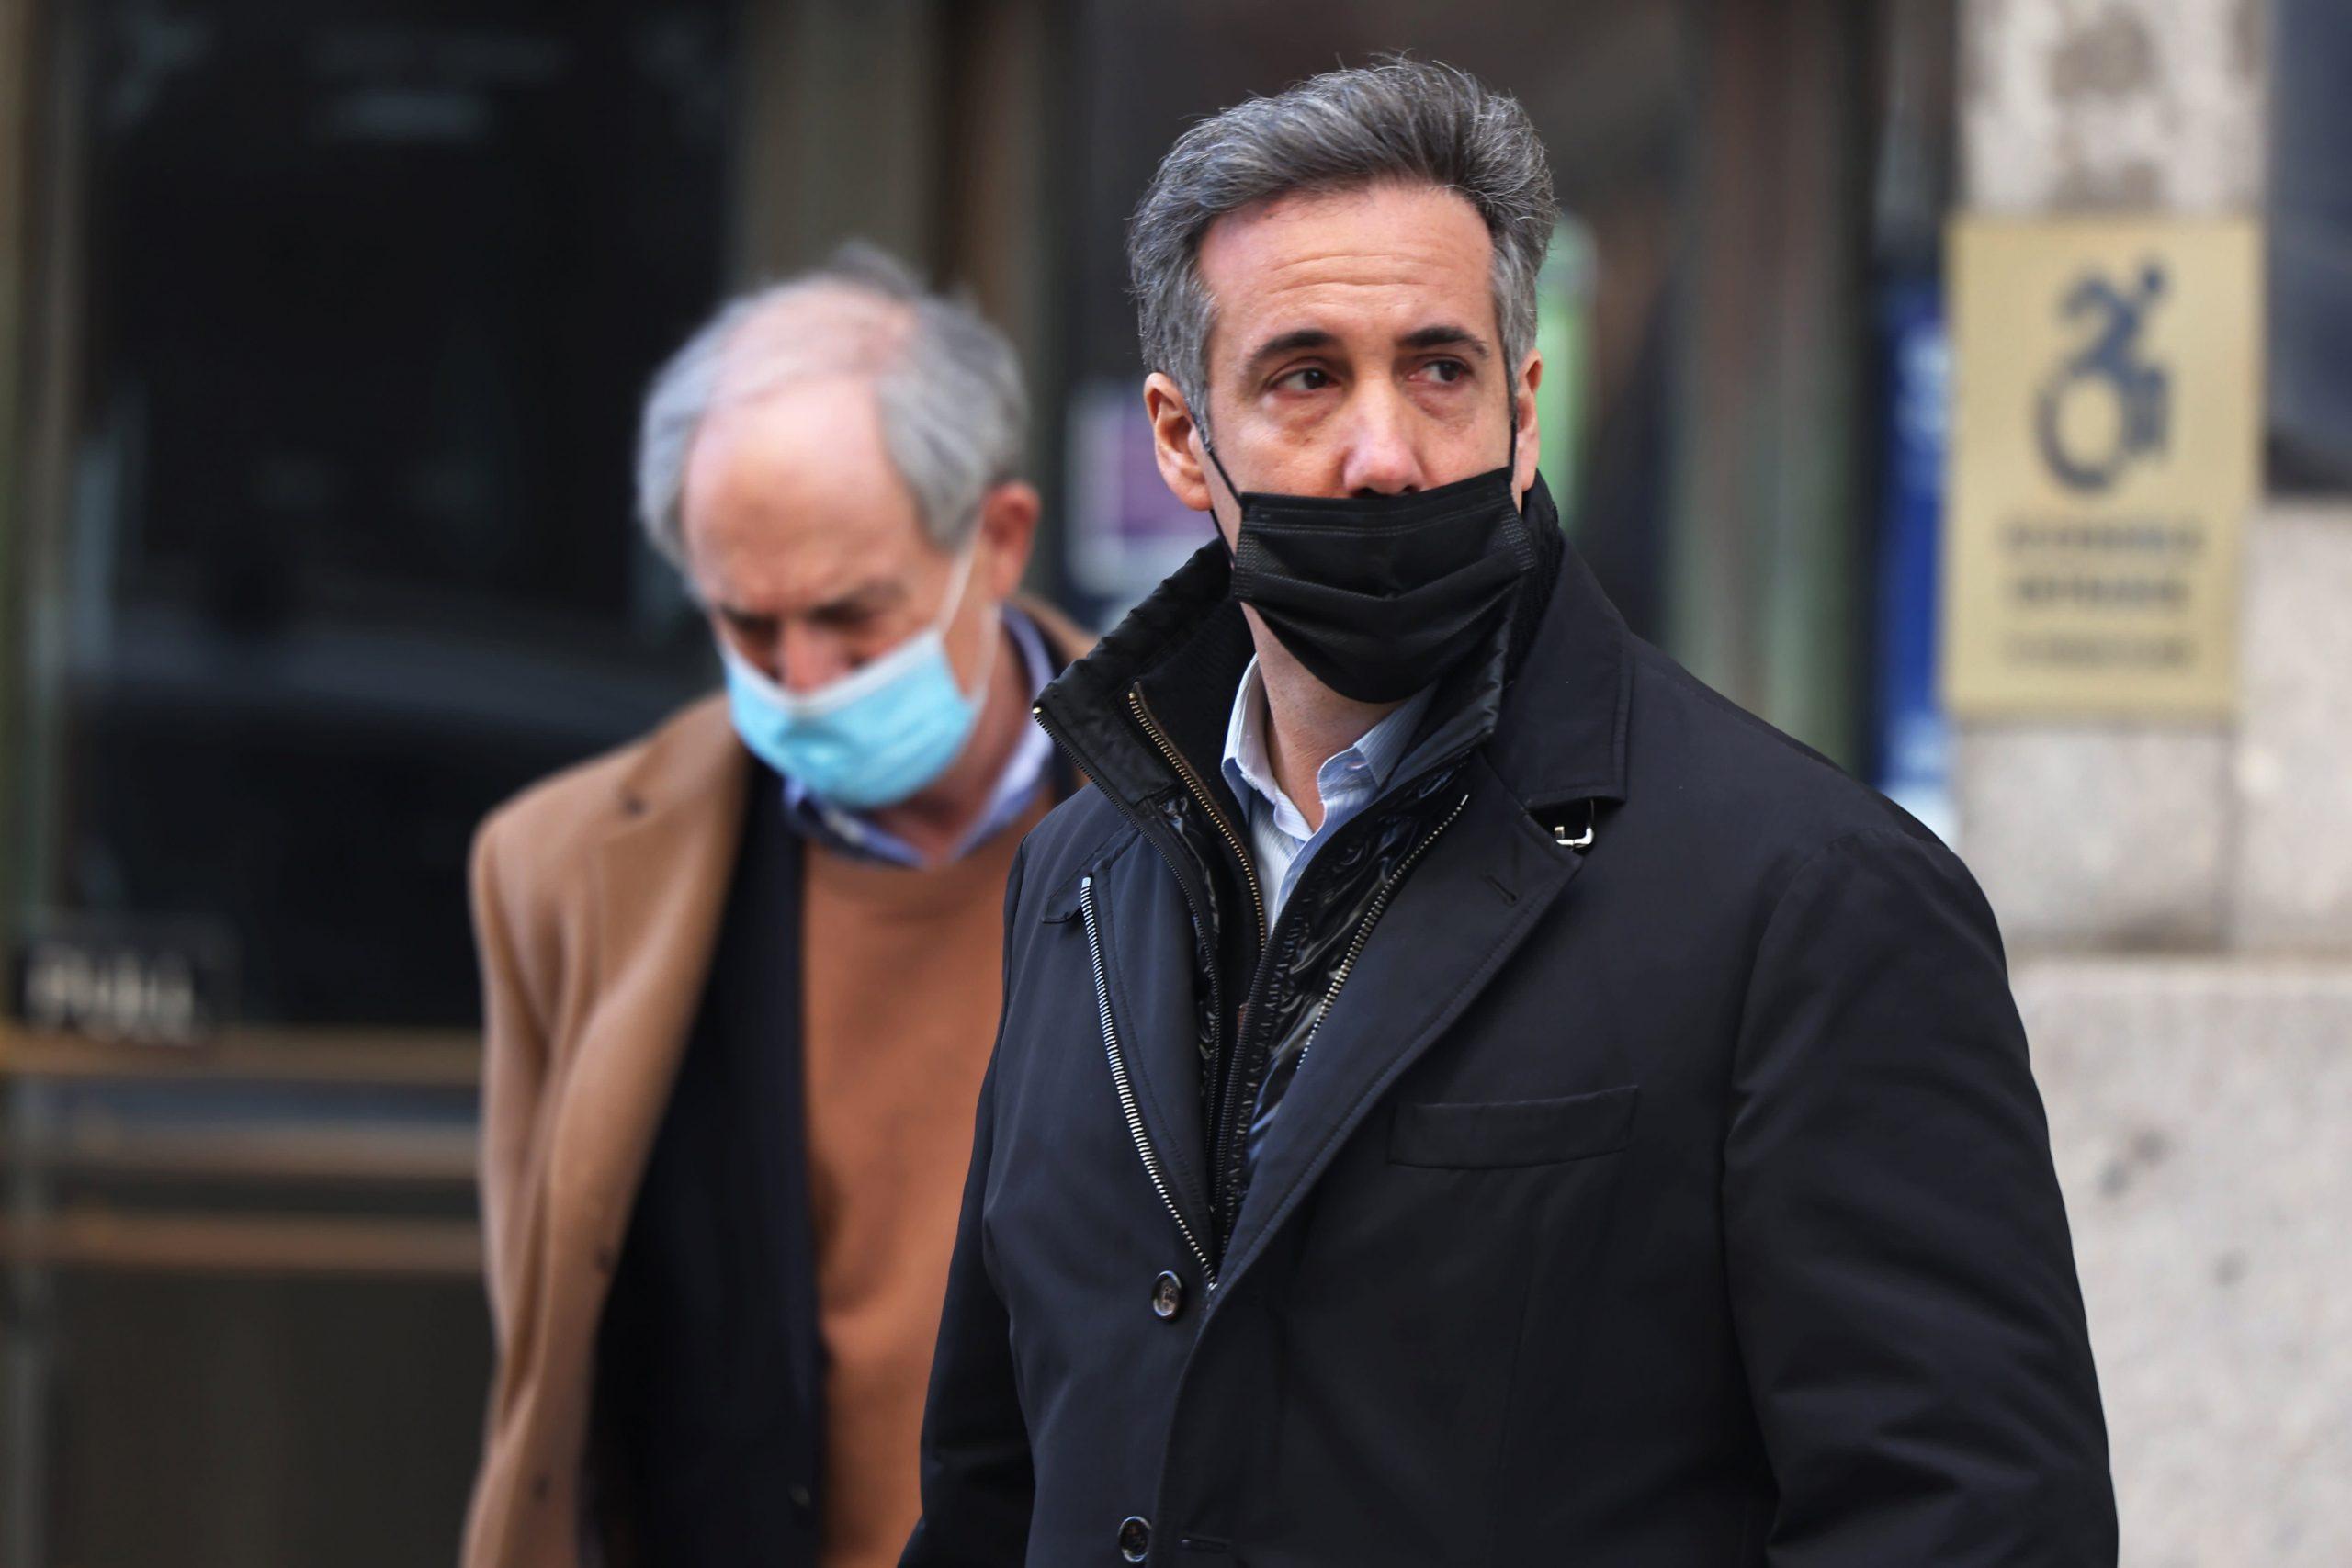 Former Trump lawyer Michael Cohen asks judge to suspend home confinement